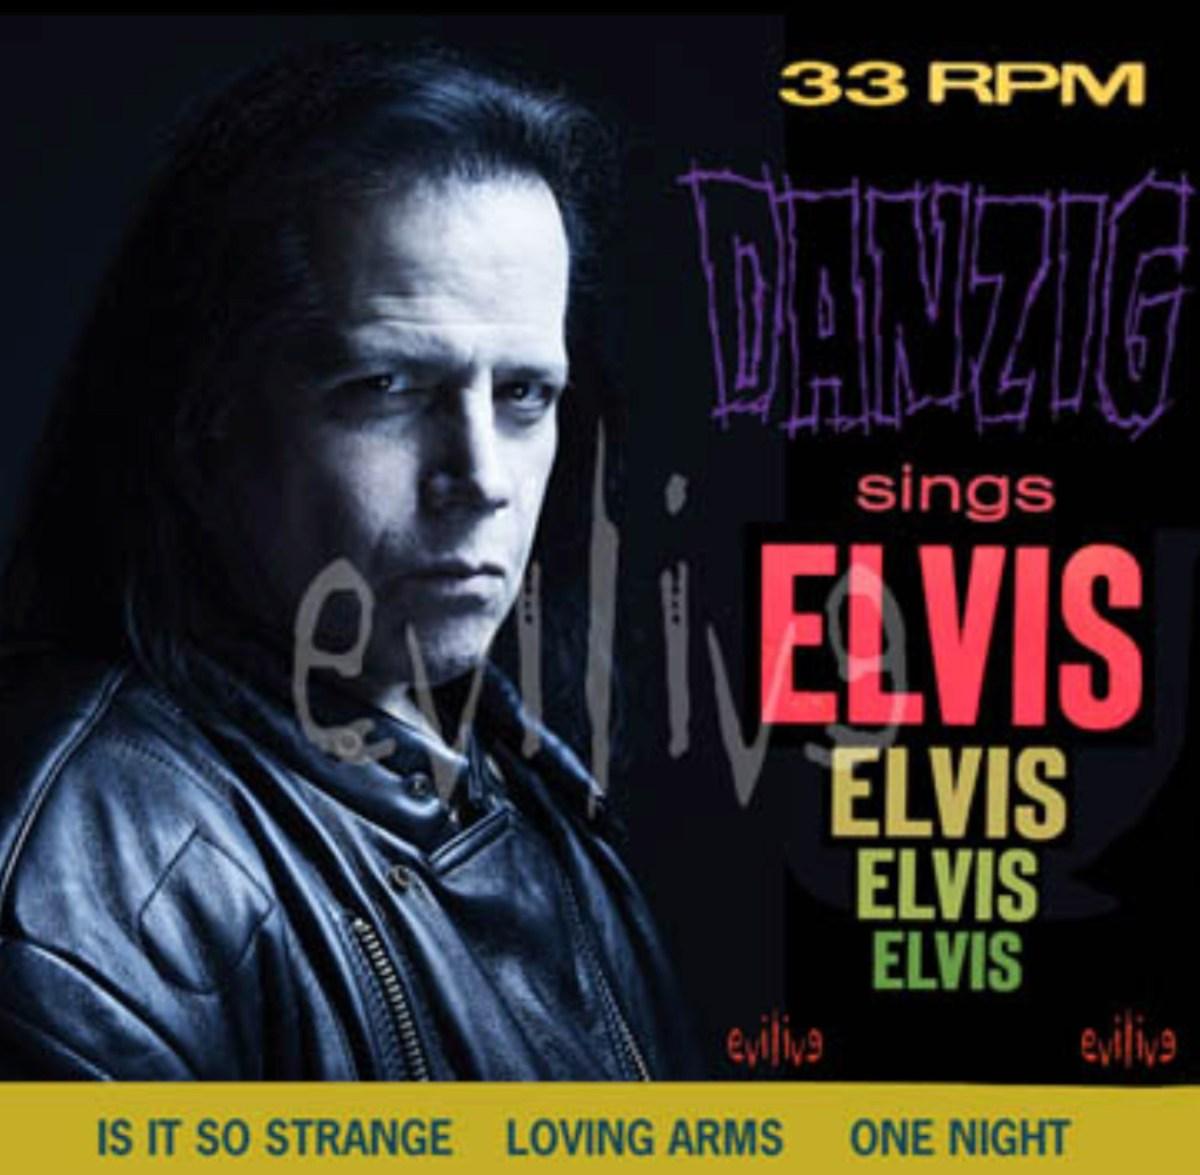 The Misfits' Glenn Danzig's